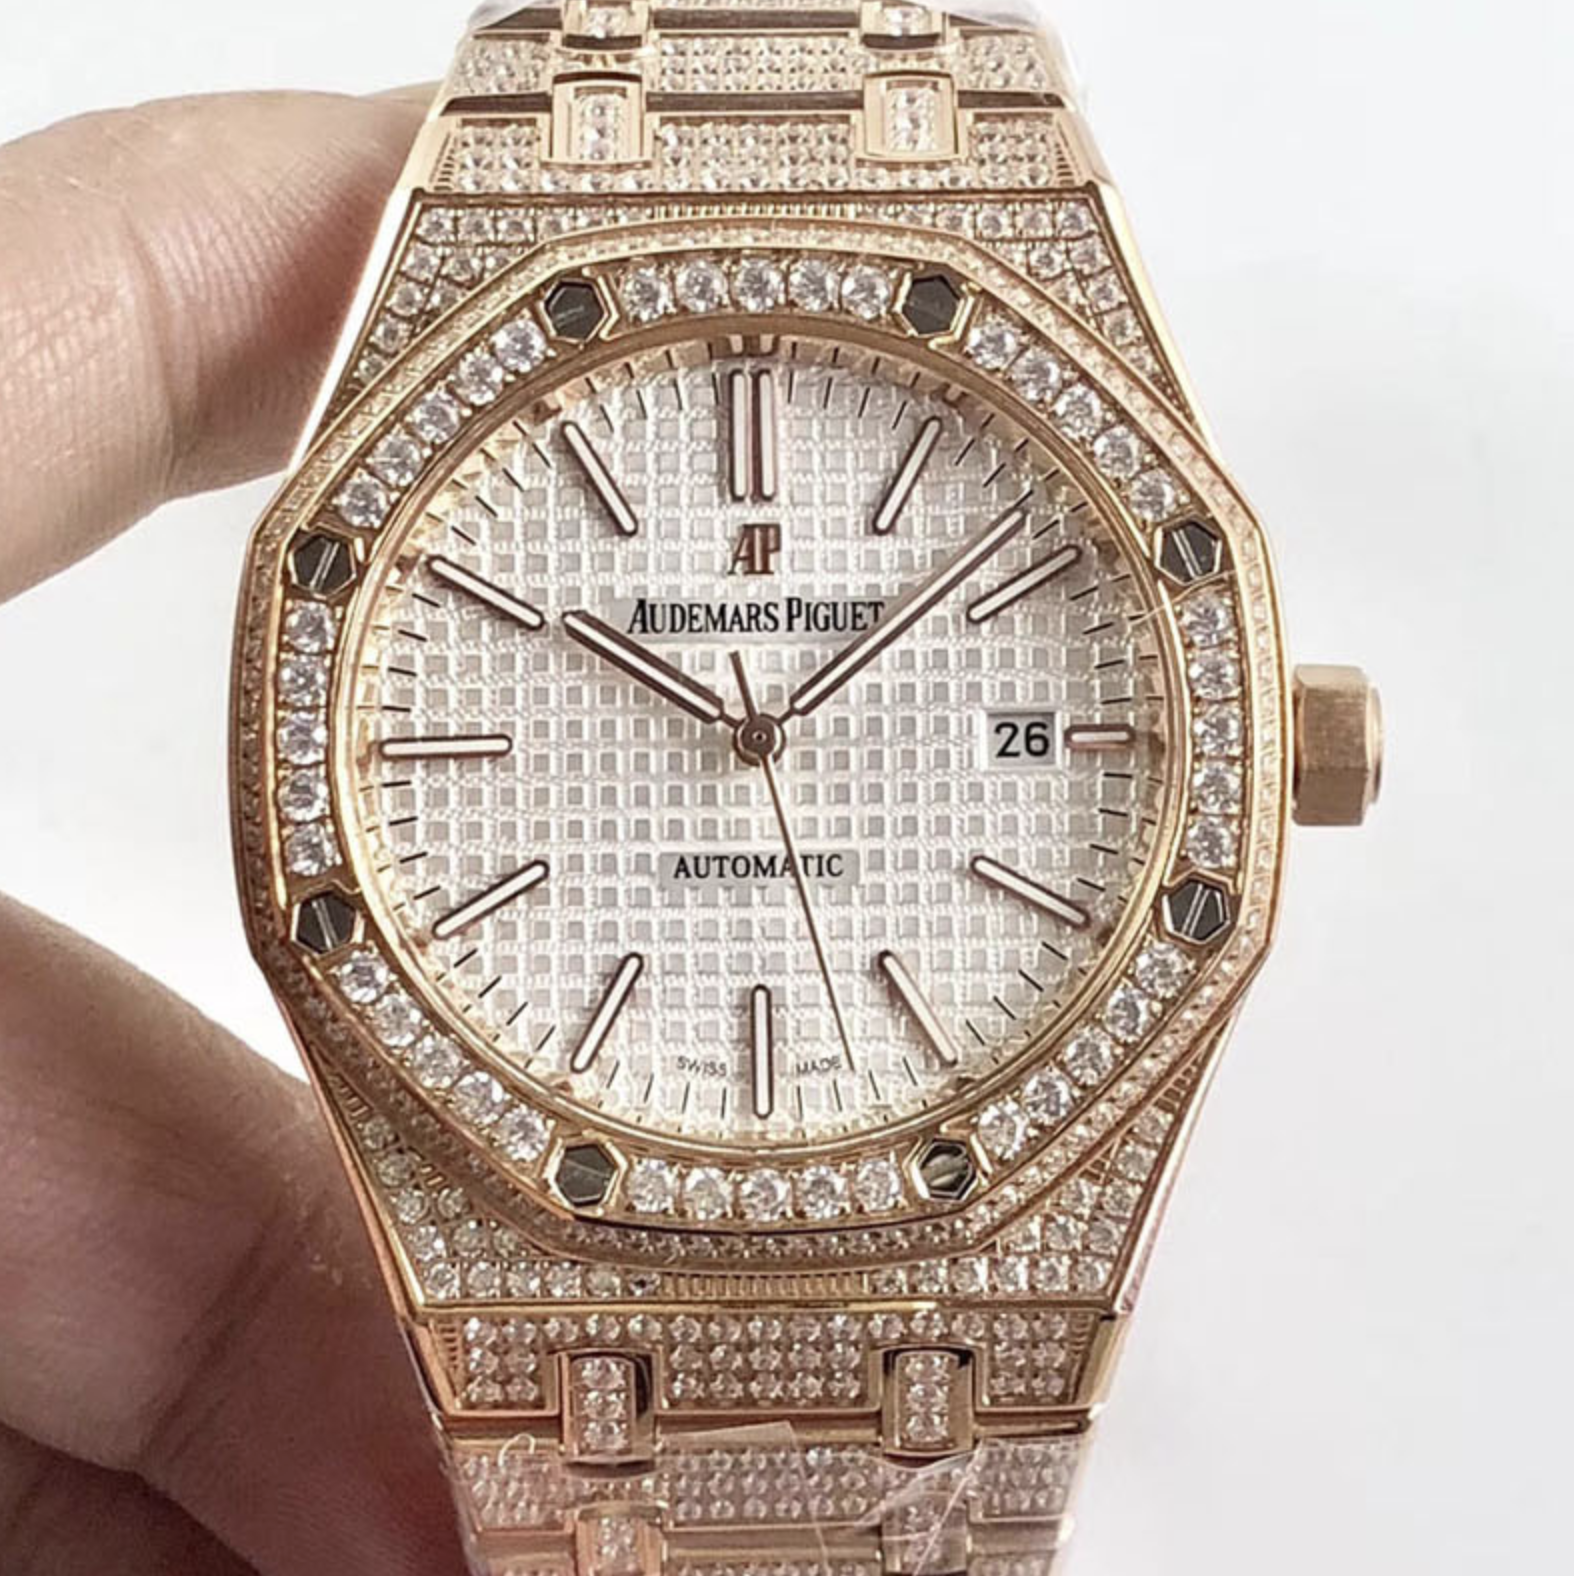 Audemars piguet replica royal oak 15400ST 41mm rose gold full paved diamonds white dial